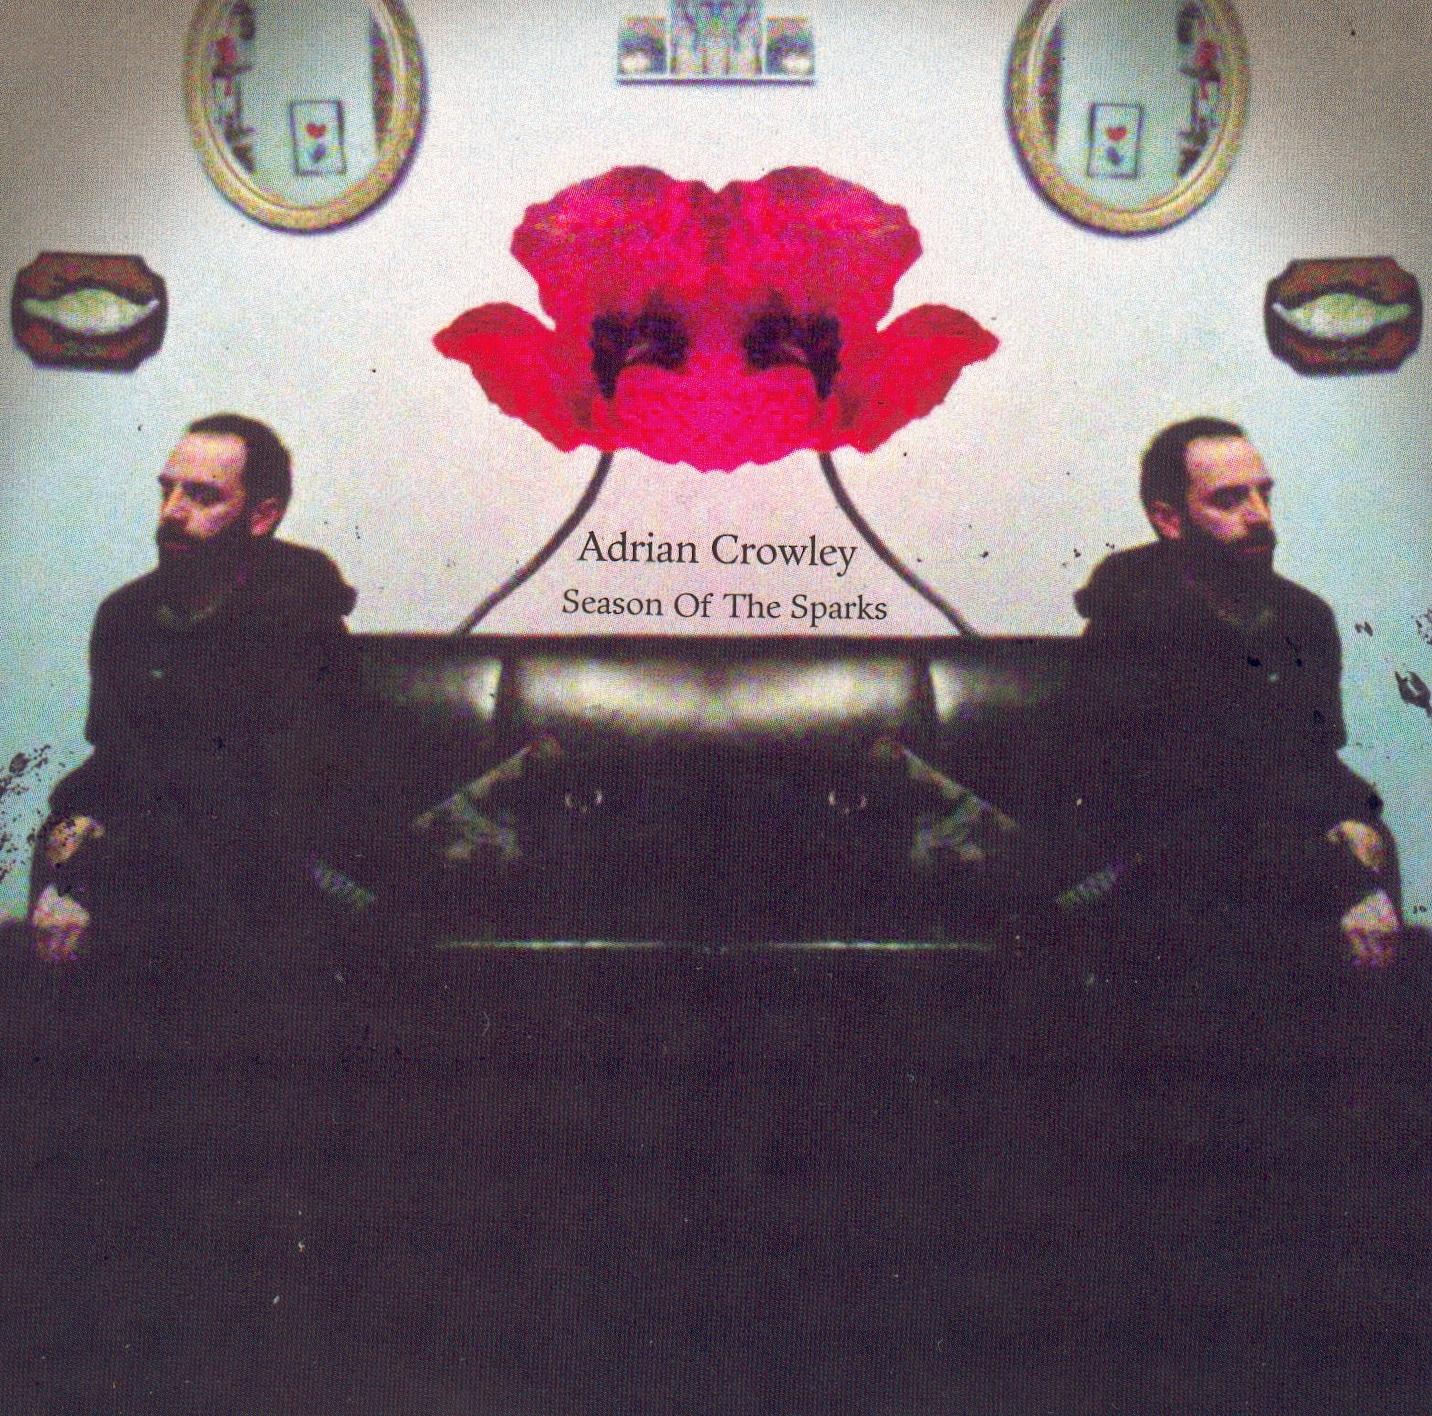 Adrian Crowley - Season Of The Sparks - Digital Album (2009) - Adrian Crowley